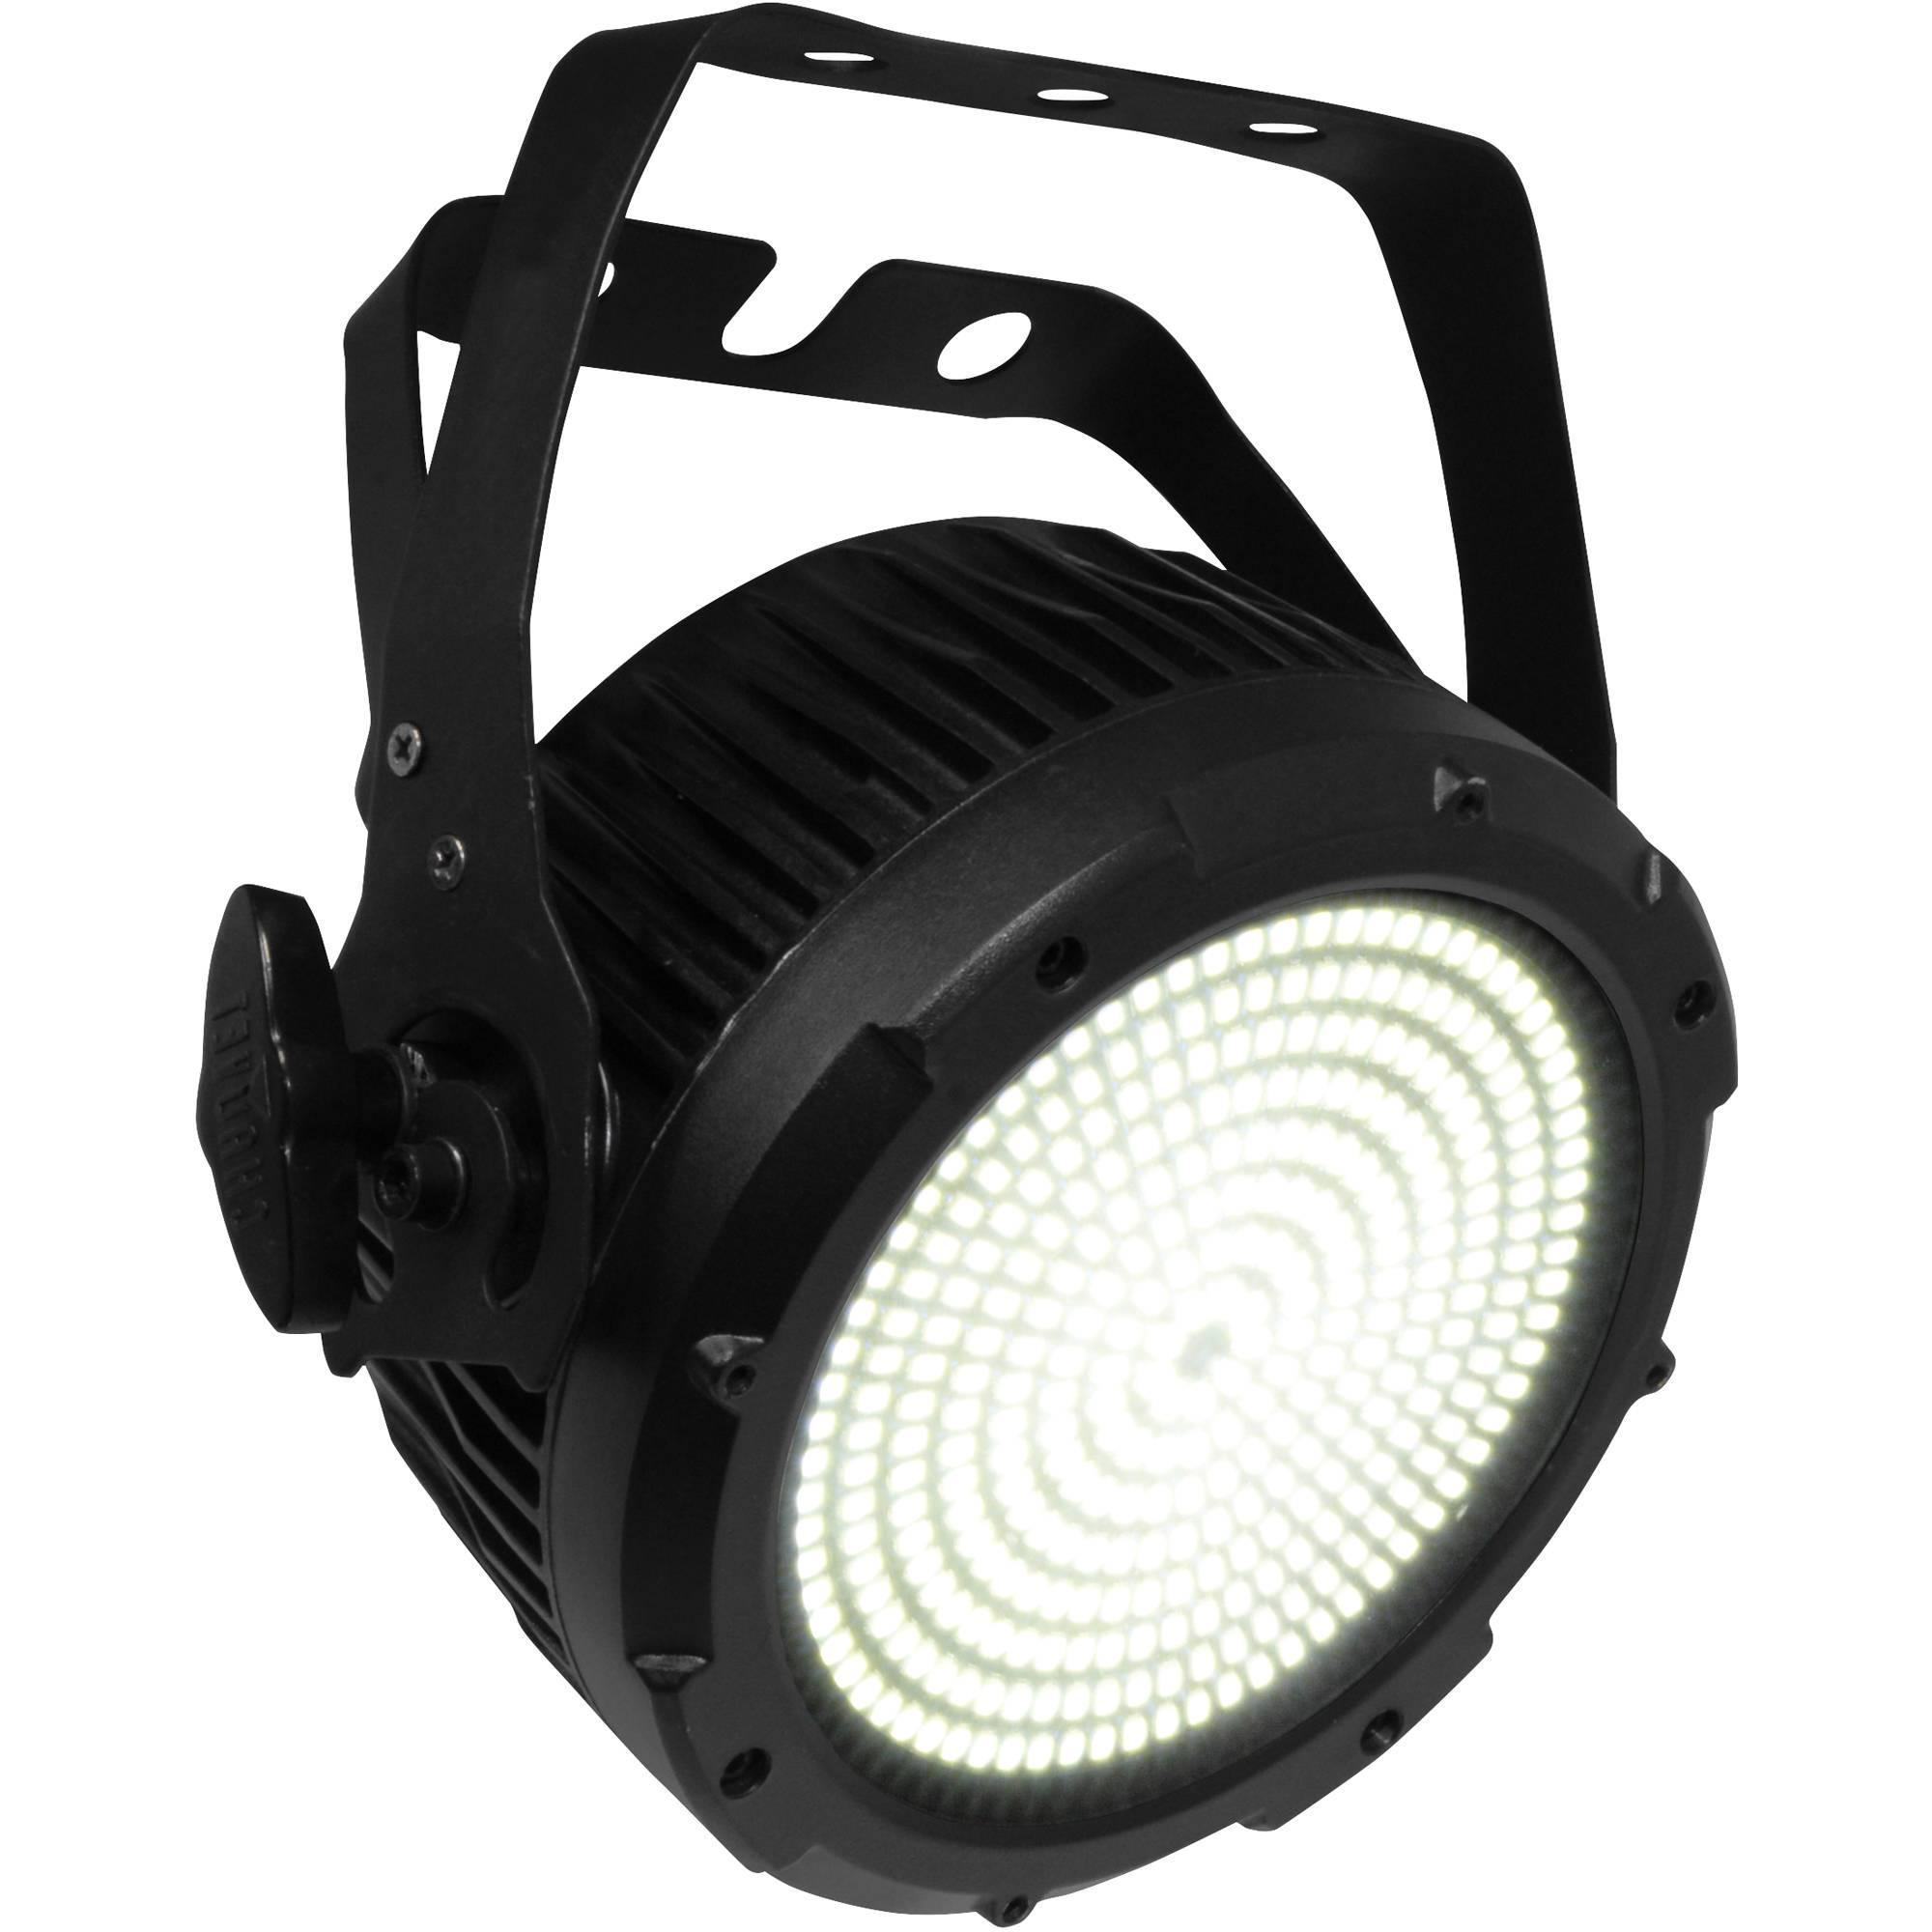 Chauvet Strike 324 LED DJ Lighting